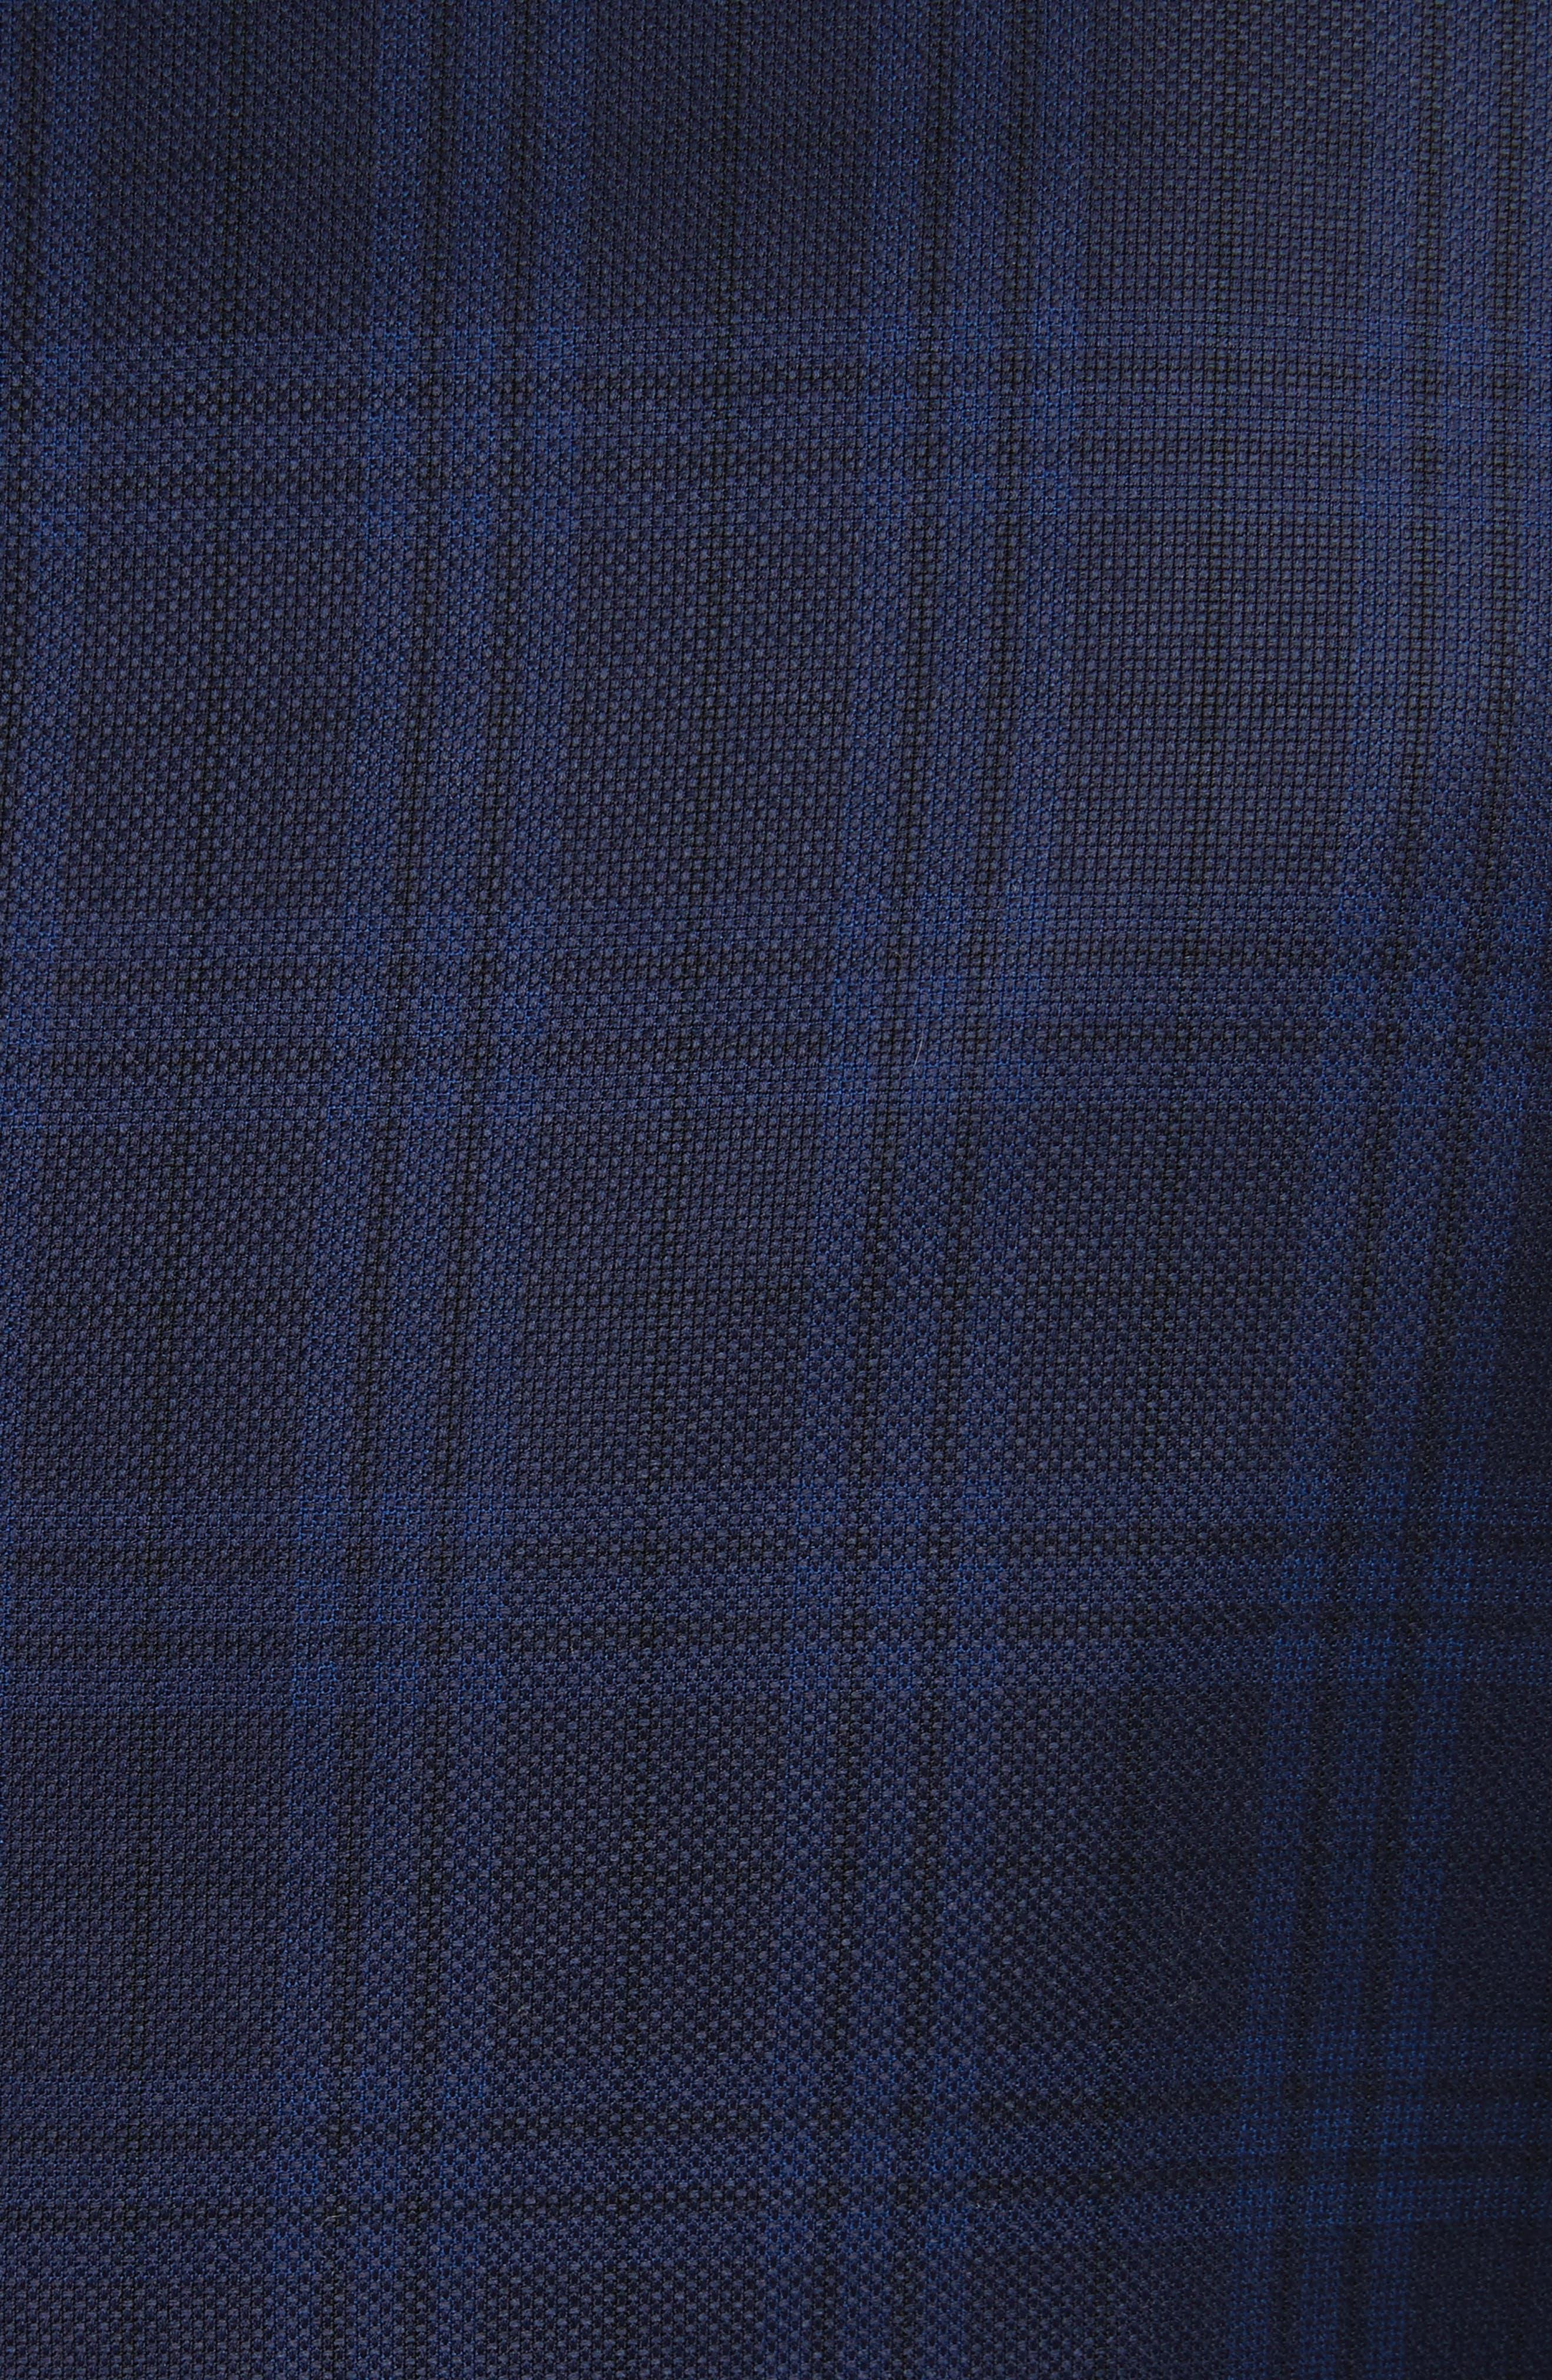 G-Line Trim Fit Houndstooth Wool Sport Coat,                             Alternate thumbnail 5, color,                             410